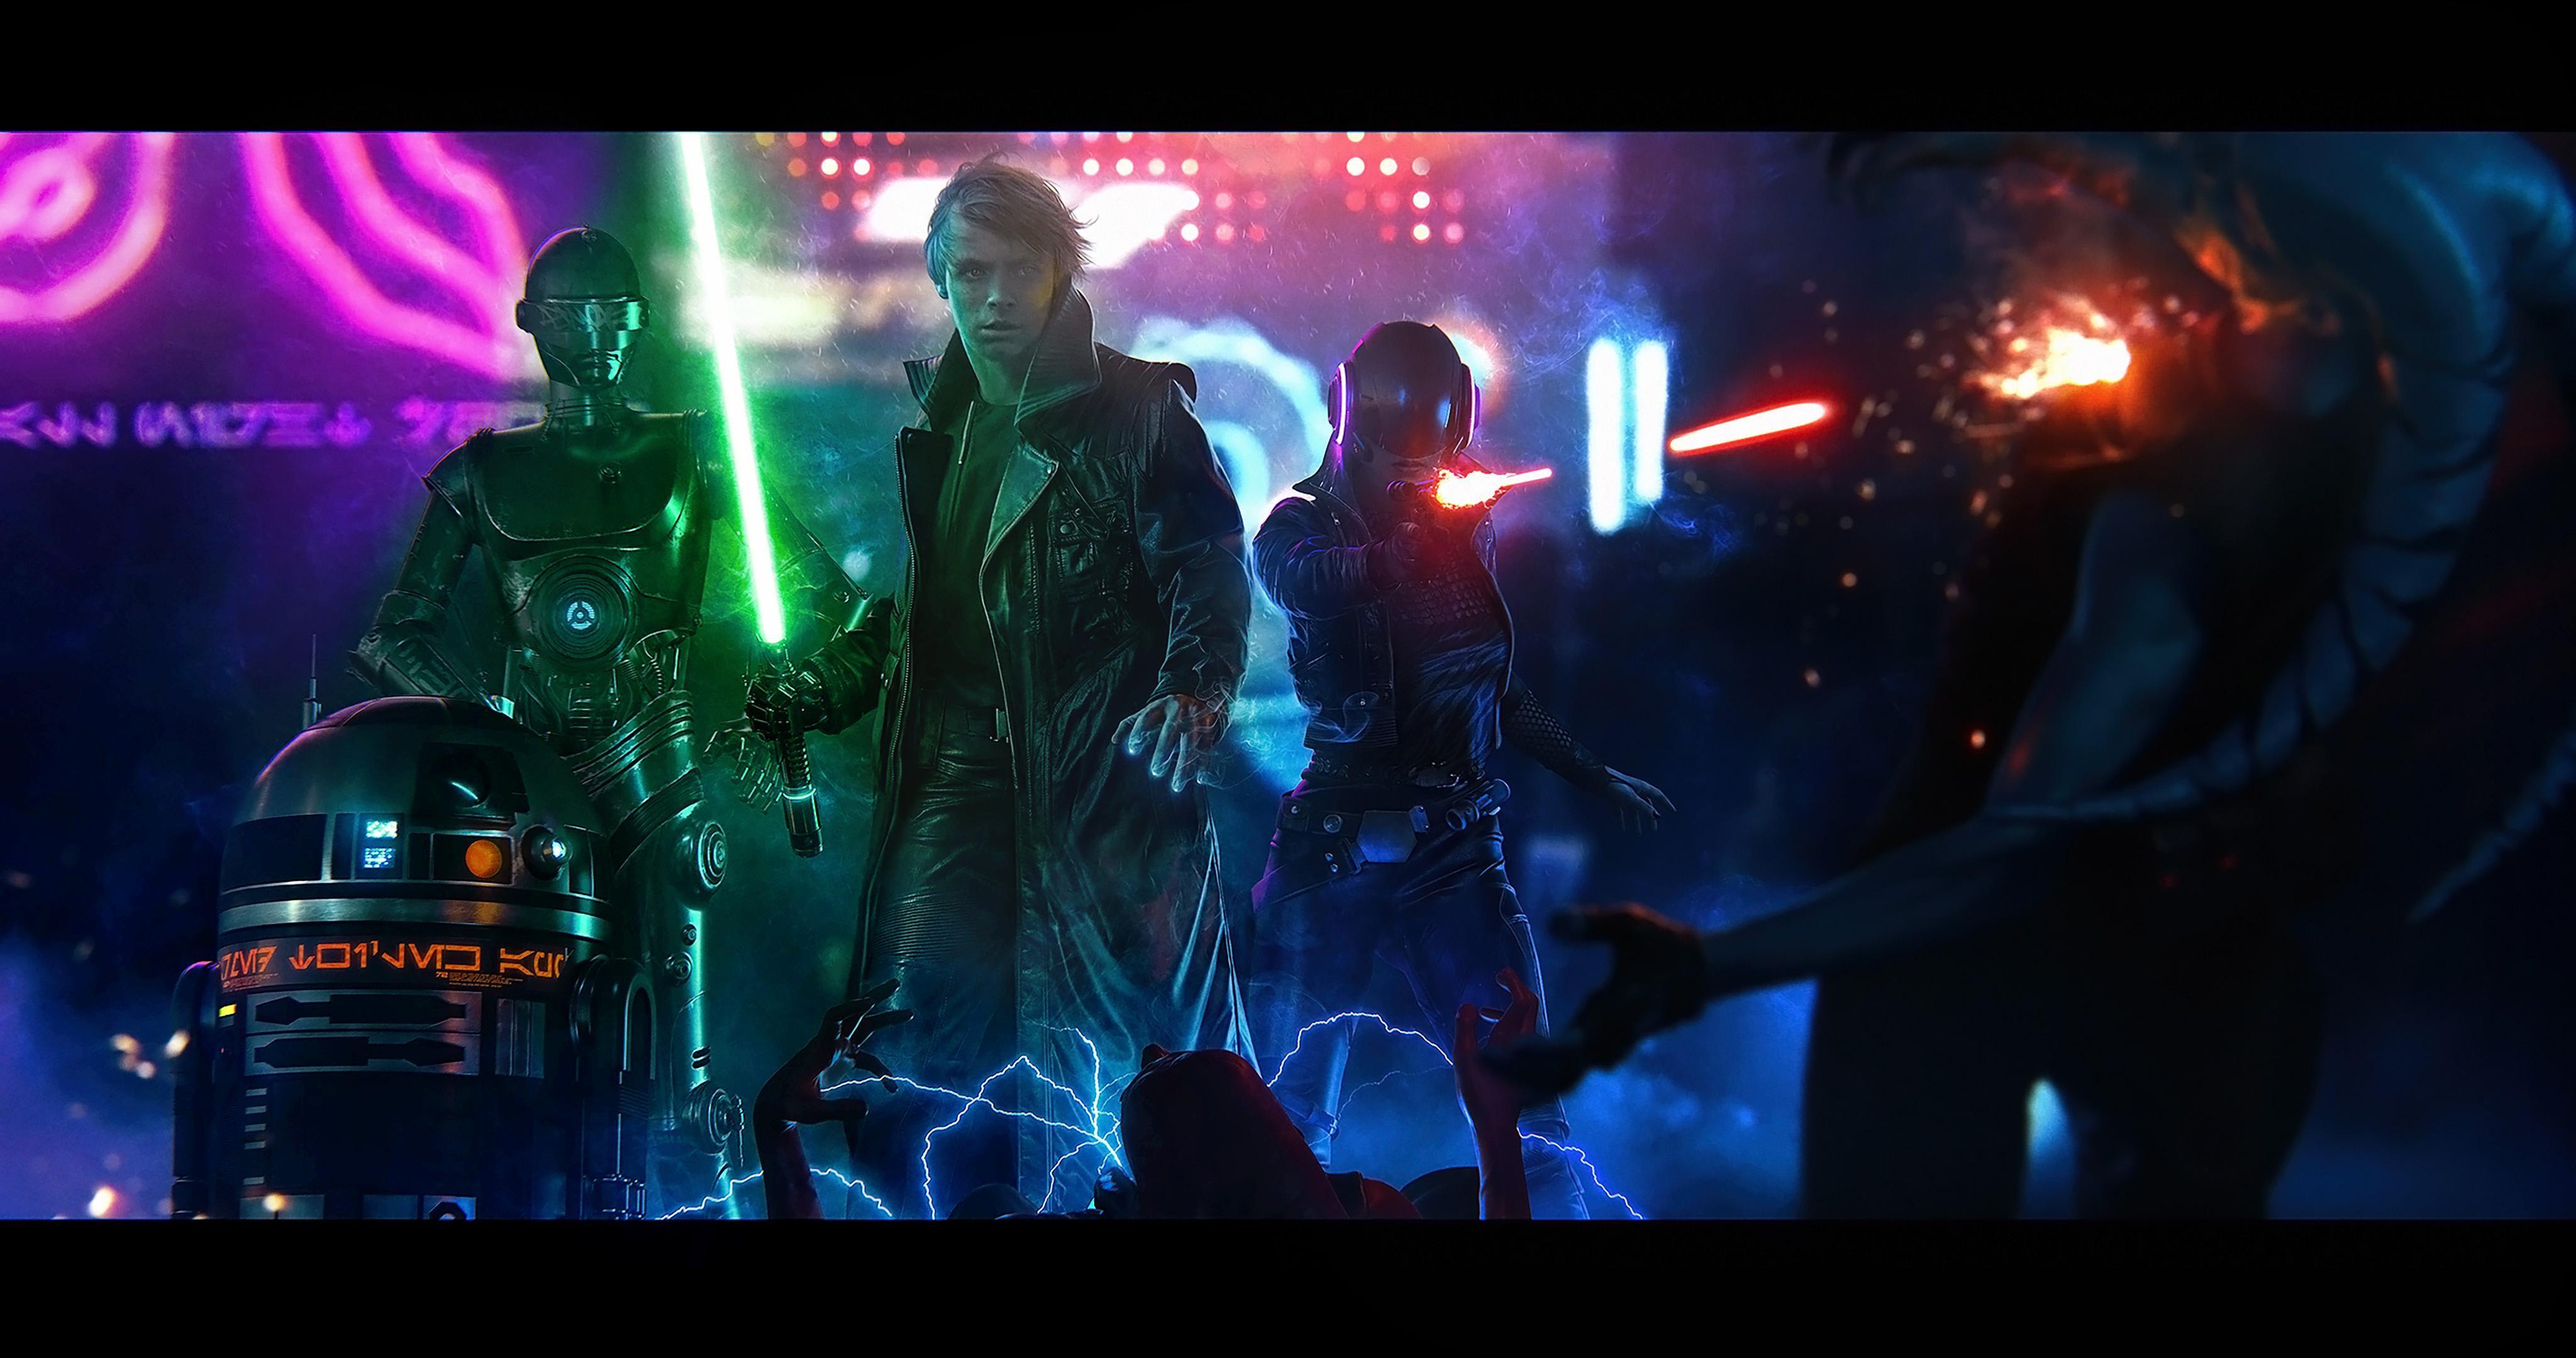 General 4096x2160 Star Wars artwork R2-D2 Luke Skywalker lightsaber Jedi digital art render science fiction cyberpunk Star Wars Droids